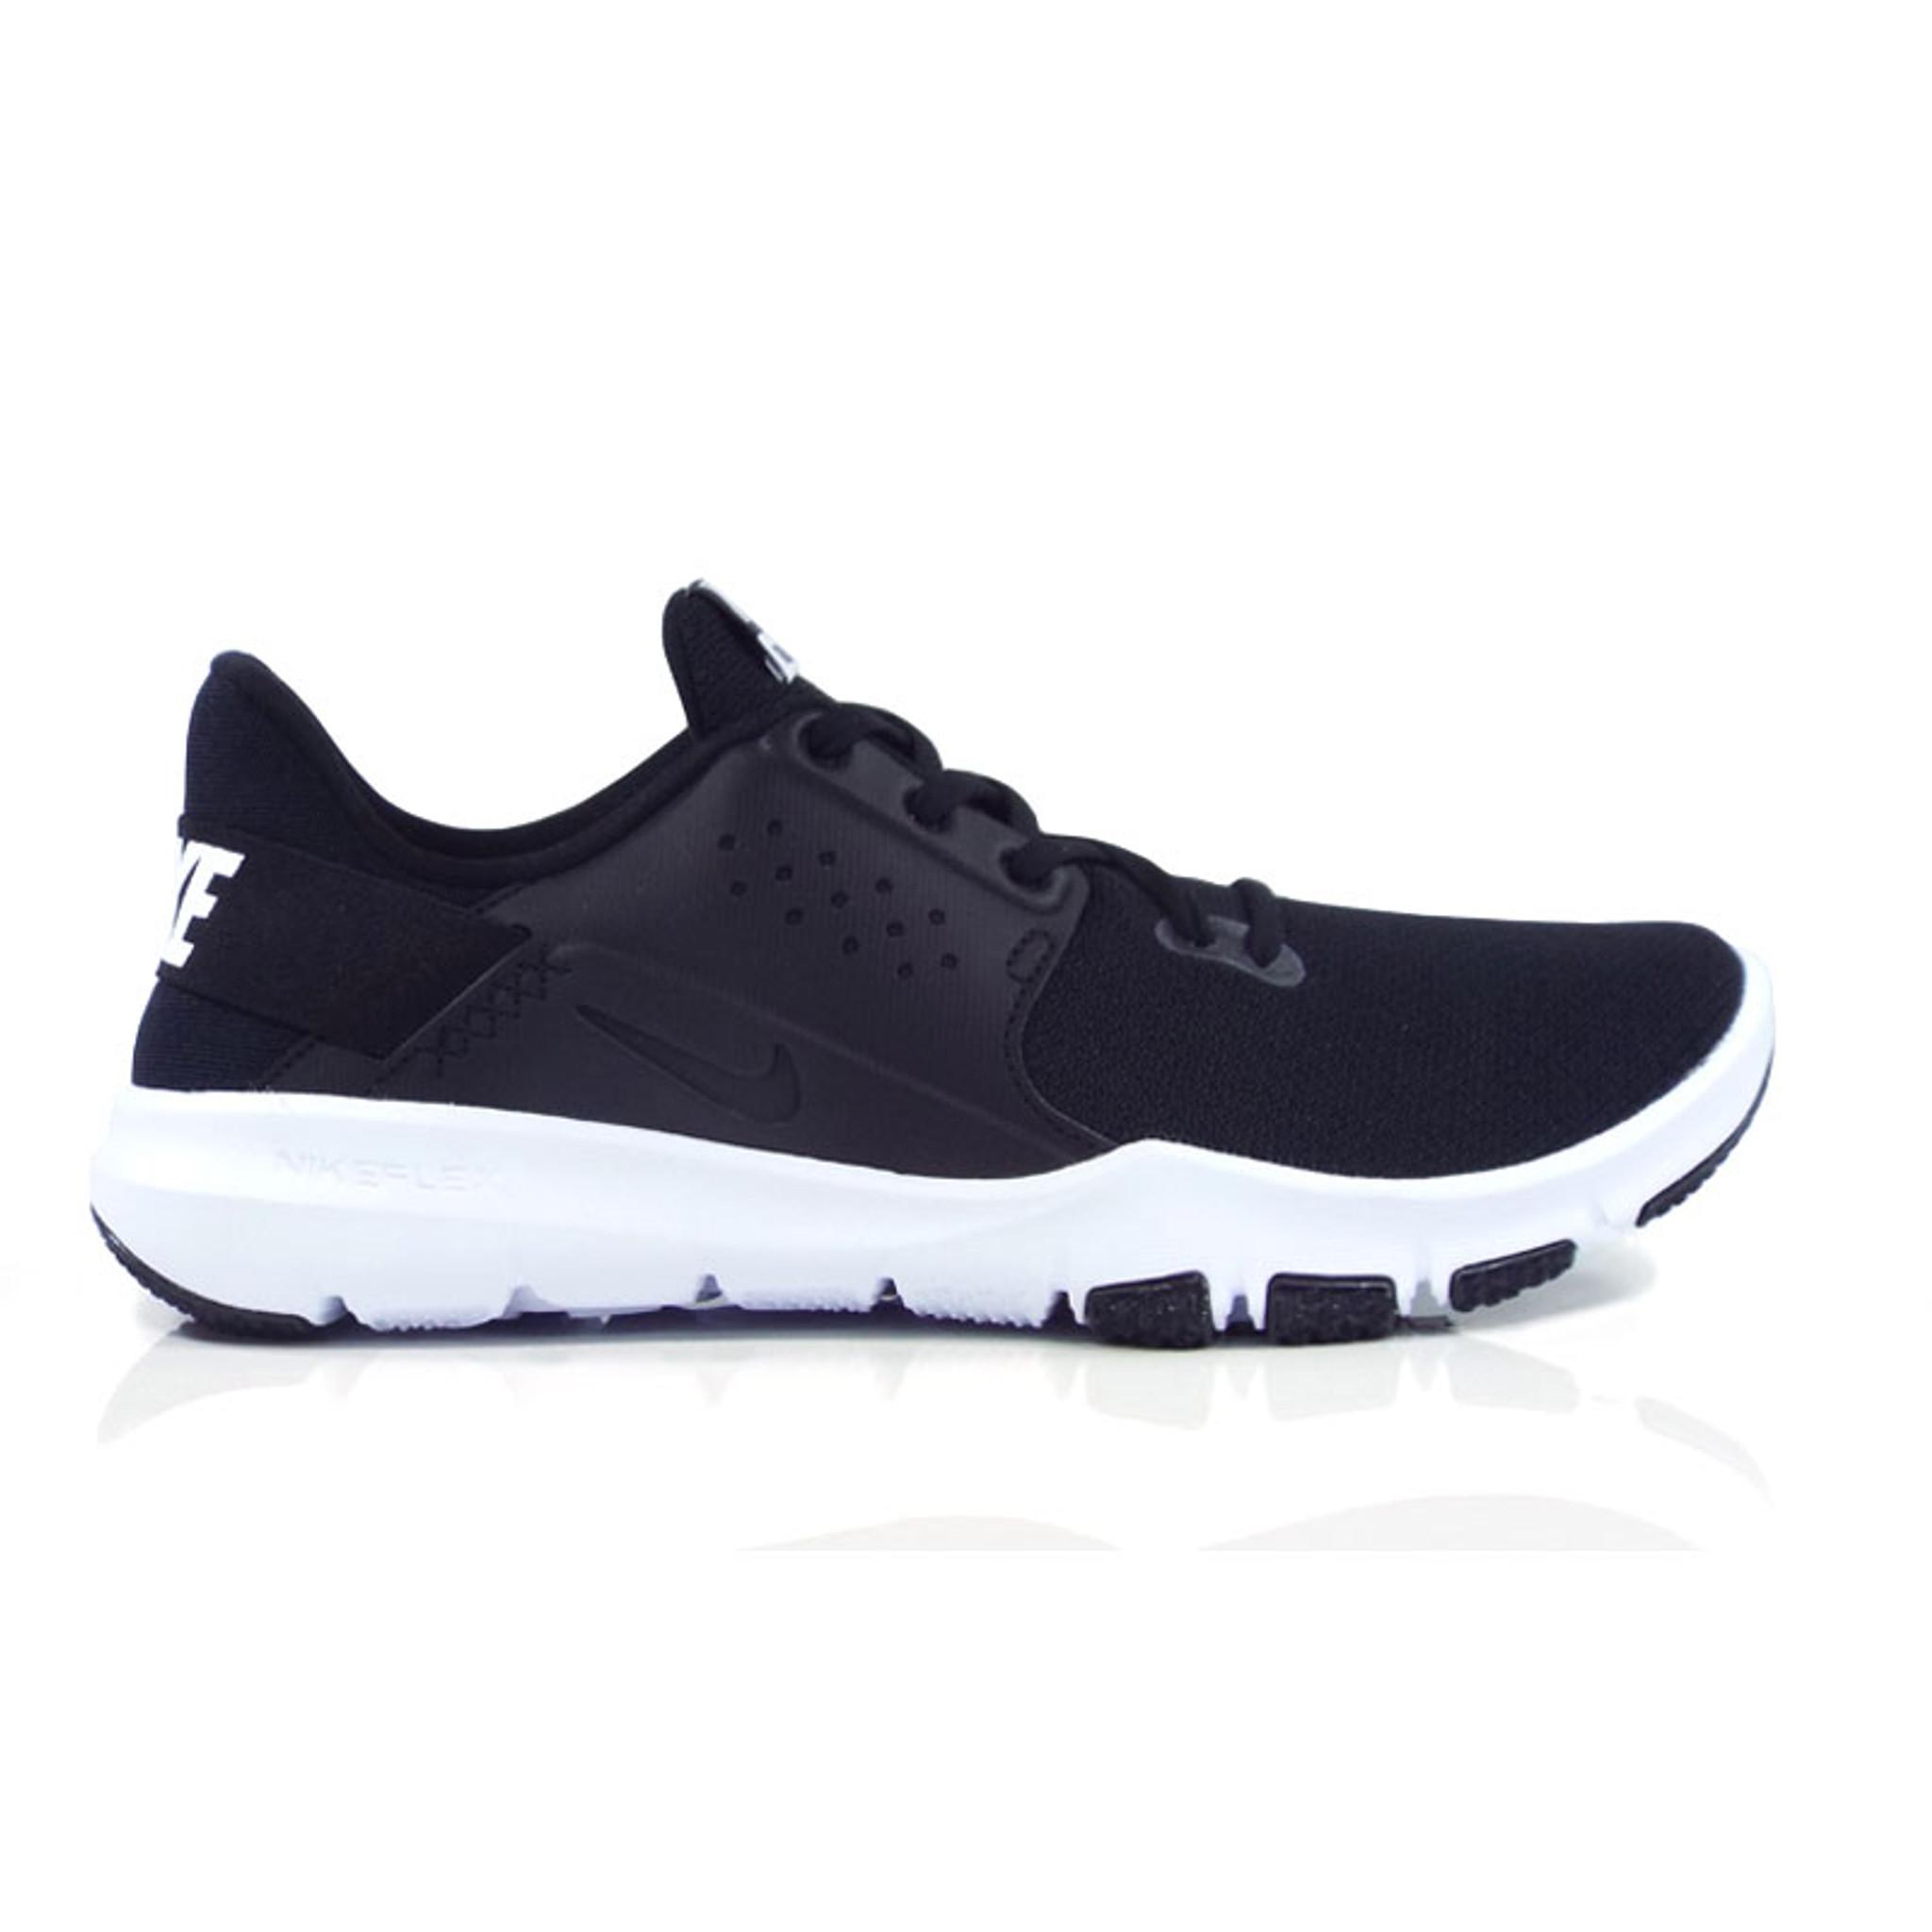 3ded2ed4 Nike Flex Control TR3 Training Shoes - Black/Black-White-Anthracite